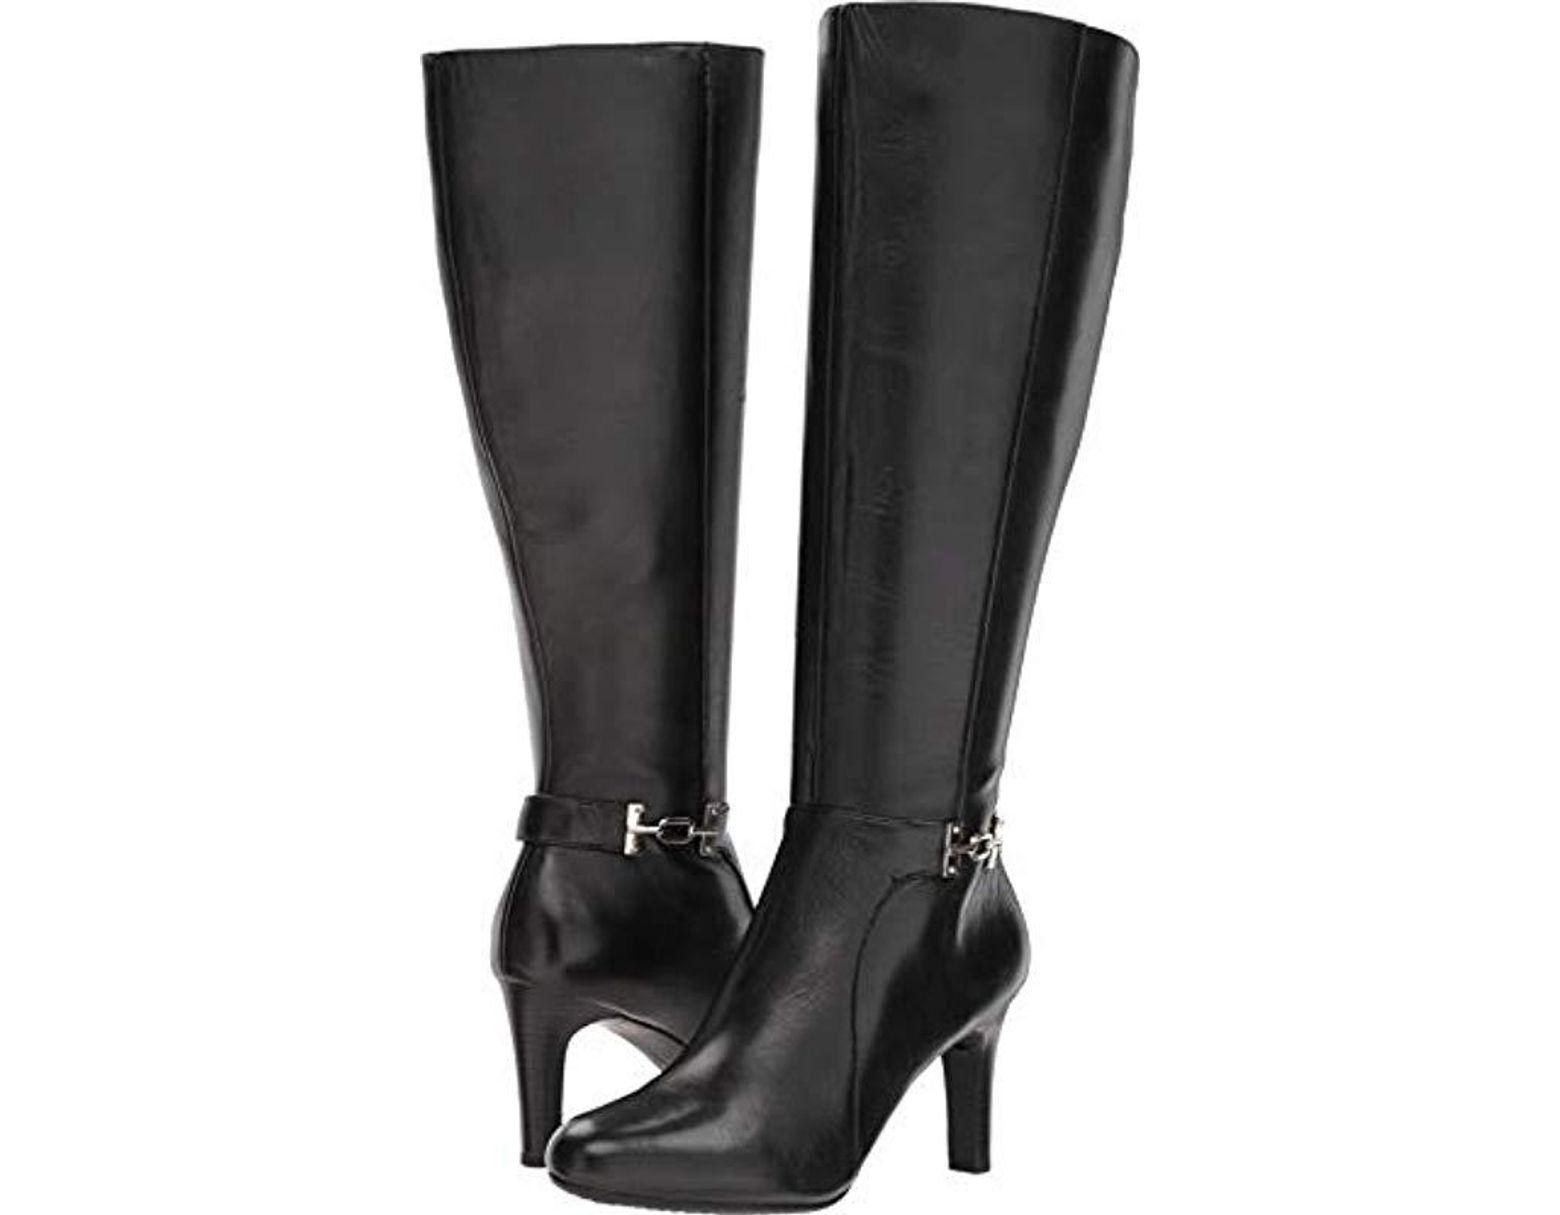 93e2713a29e Women's Black S Lamari Wide Calf Boot